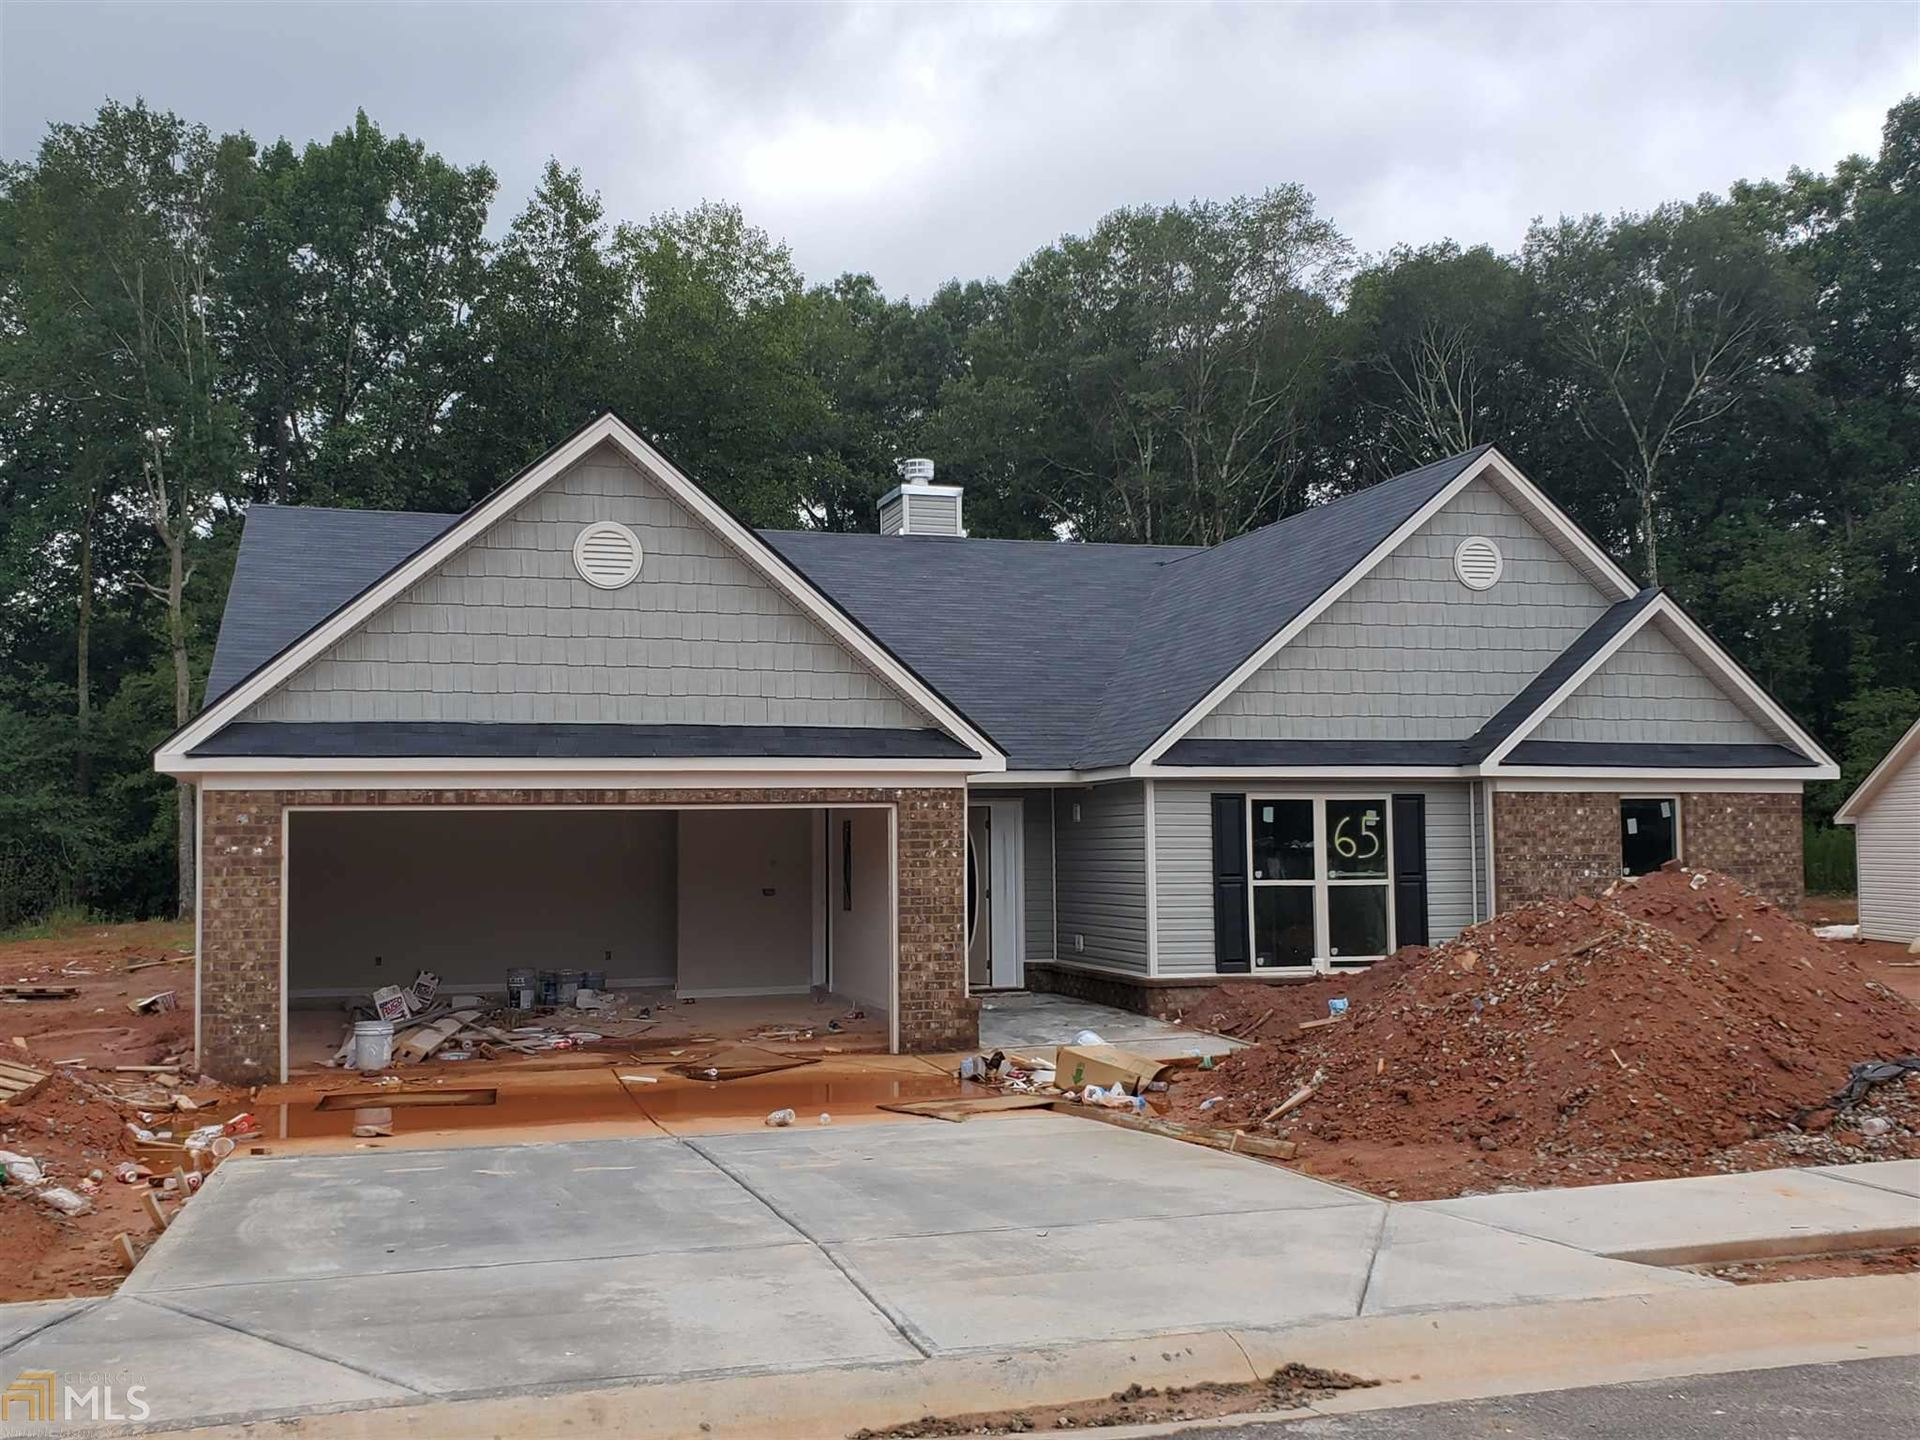 2013 Soque Cir, Jefferson, GA 30549 - MLS#: 8836831